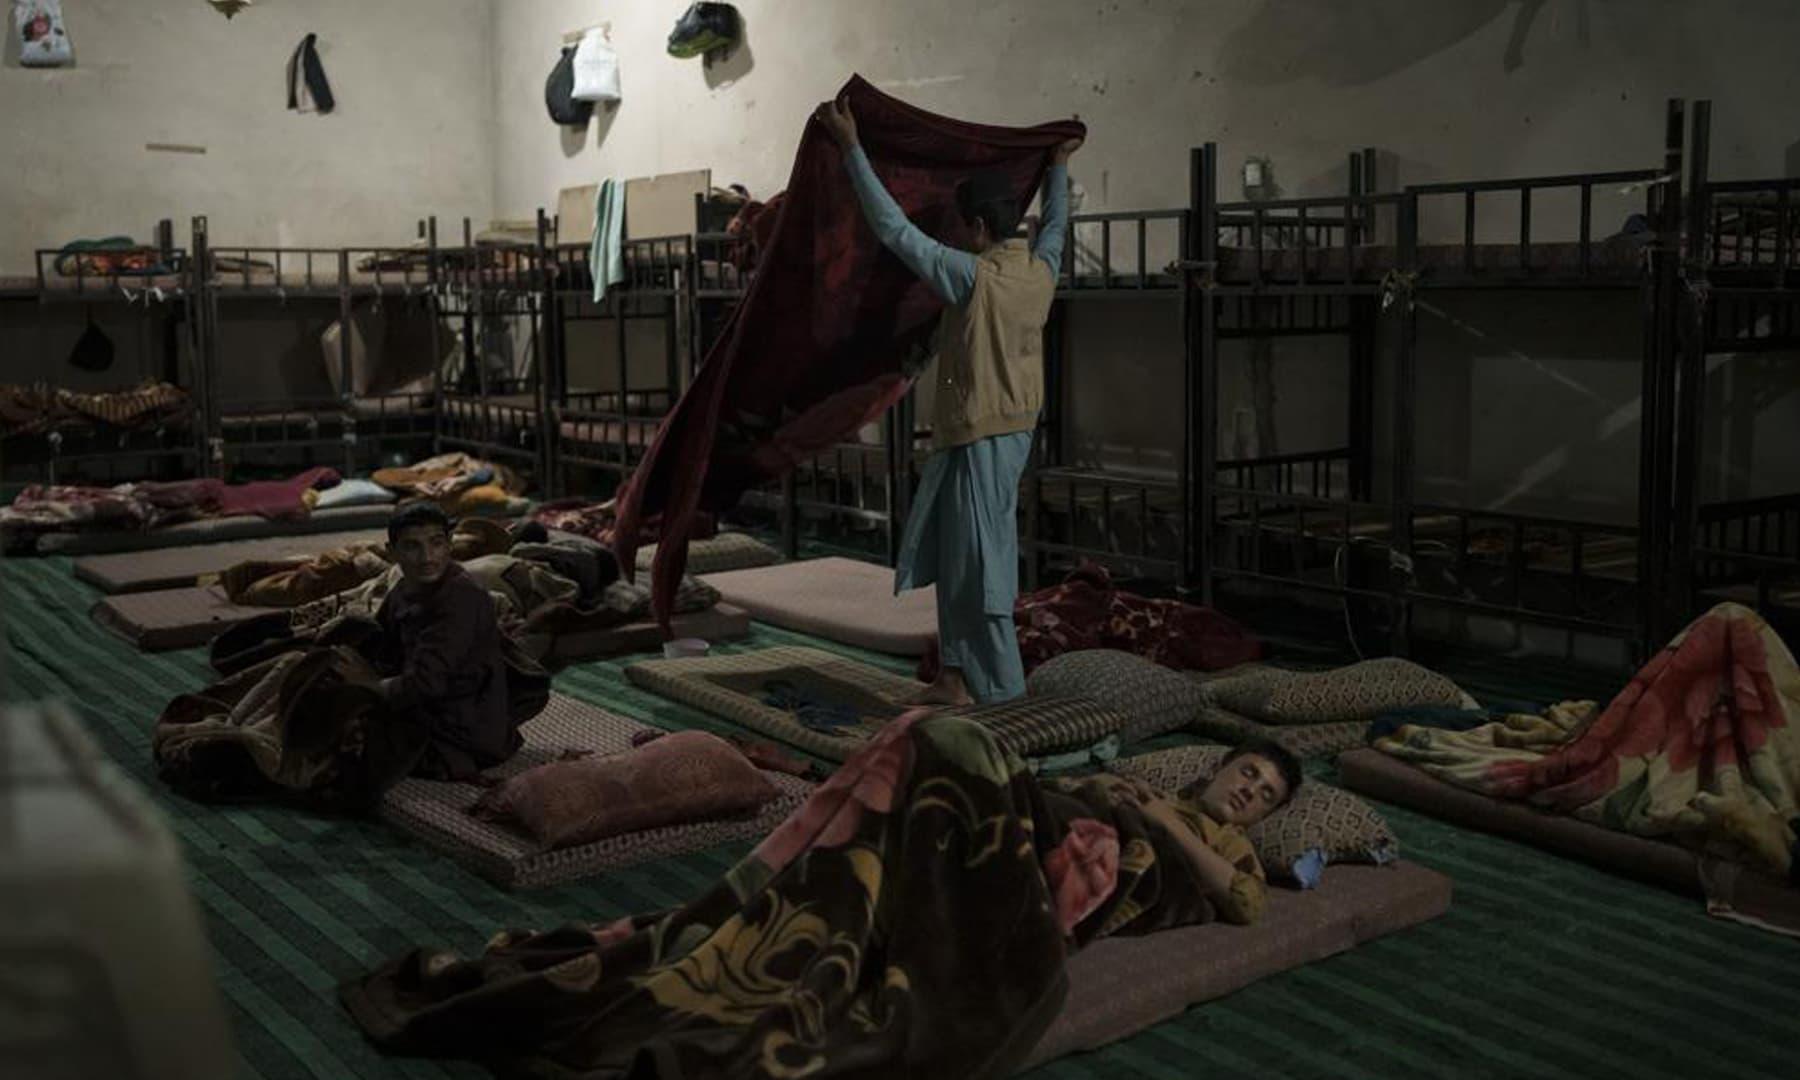 Afghan students wake up before the morning prayer at the Khatamul Anbiya madressah in Kabul, Afghanistan. — AP